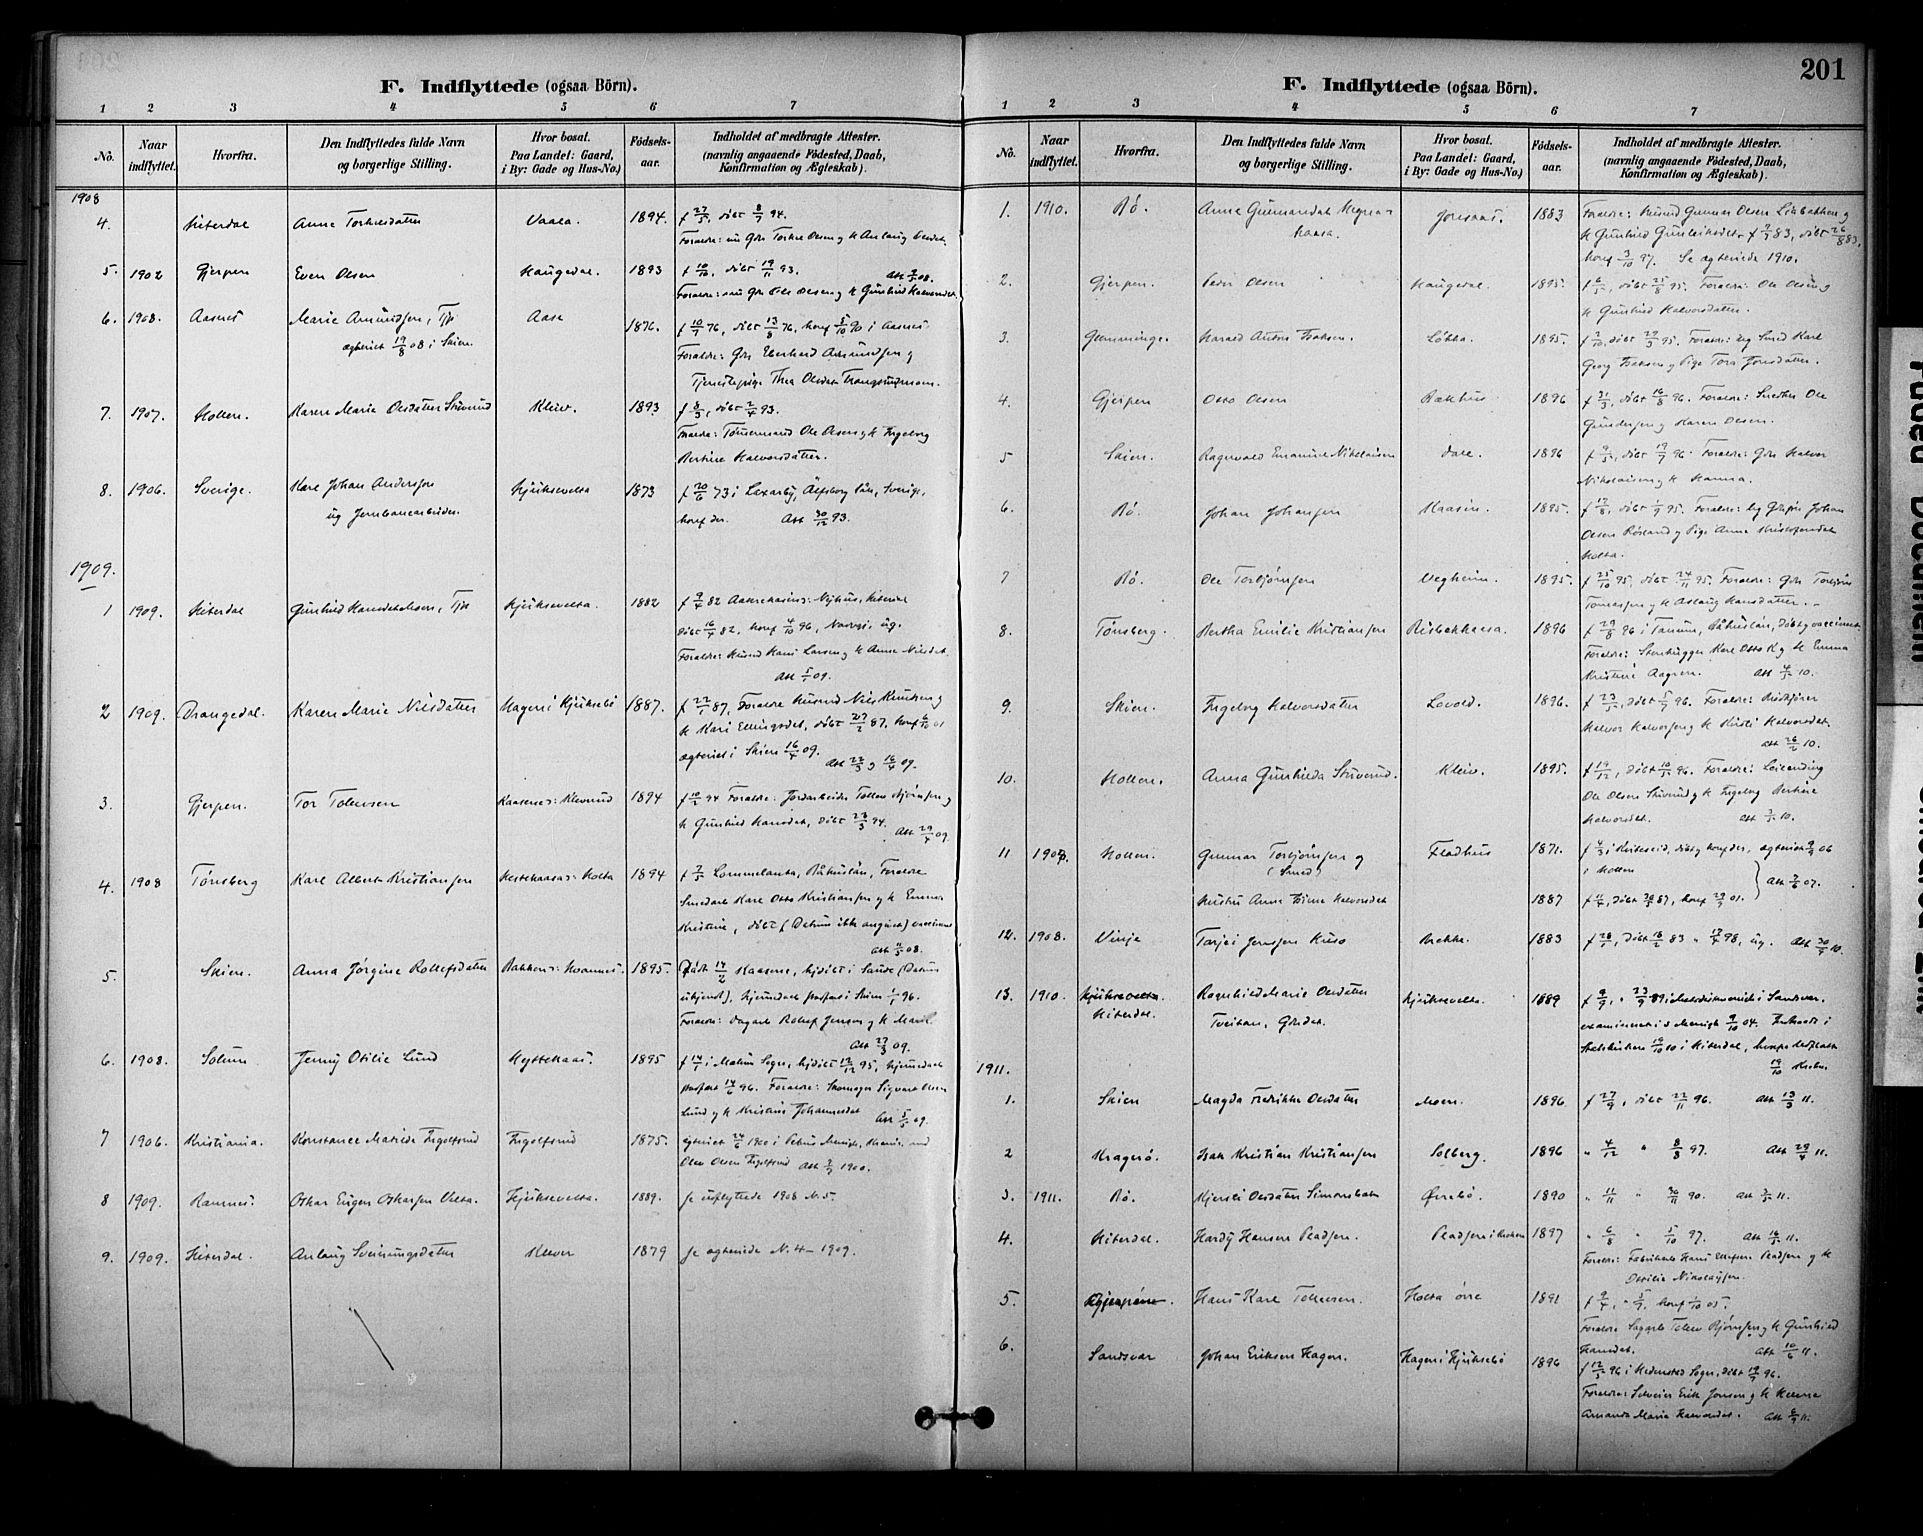 SAKO, Sauherad kirkebøker, F/Fa/L0009: Ministerialbok nr. I 9, 1887-1912, s. 201